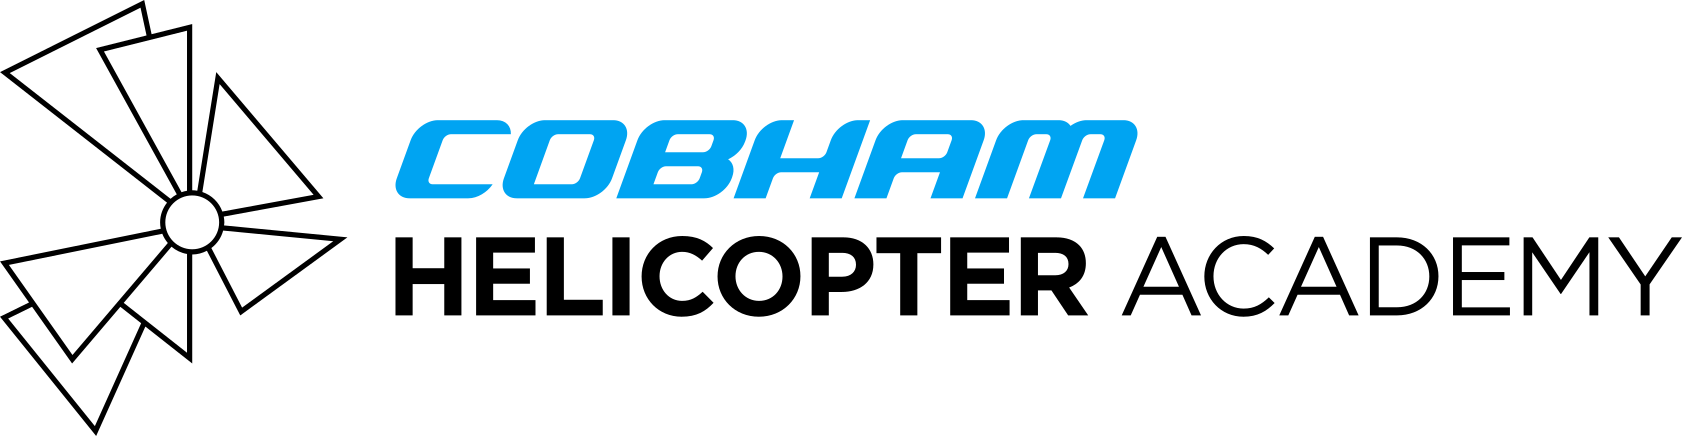 Cobham Helicopter Academy Logo